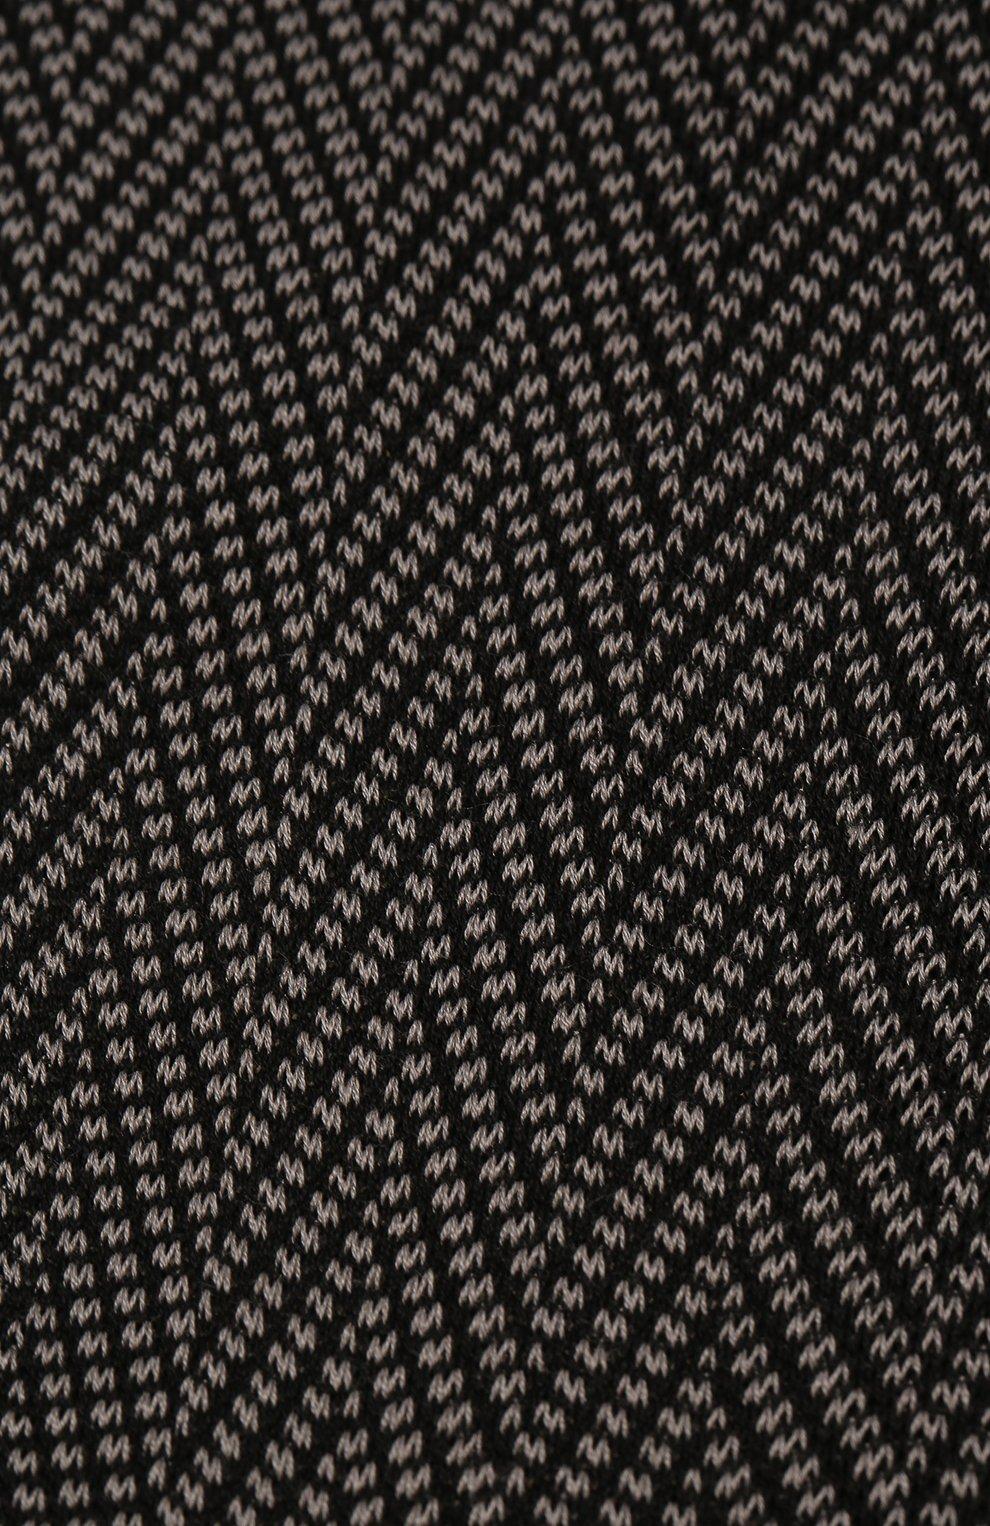 Мужские хлопковые носки TOM FORD черно-белого цвета, арт. BRCC3/TFS981 | Фото 2